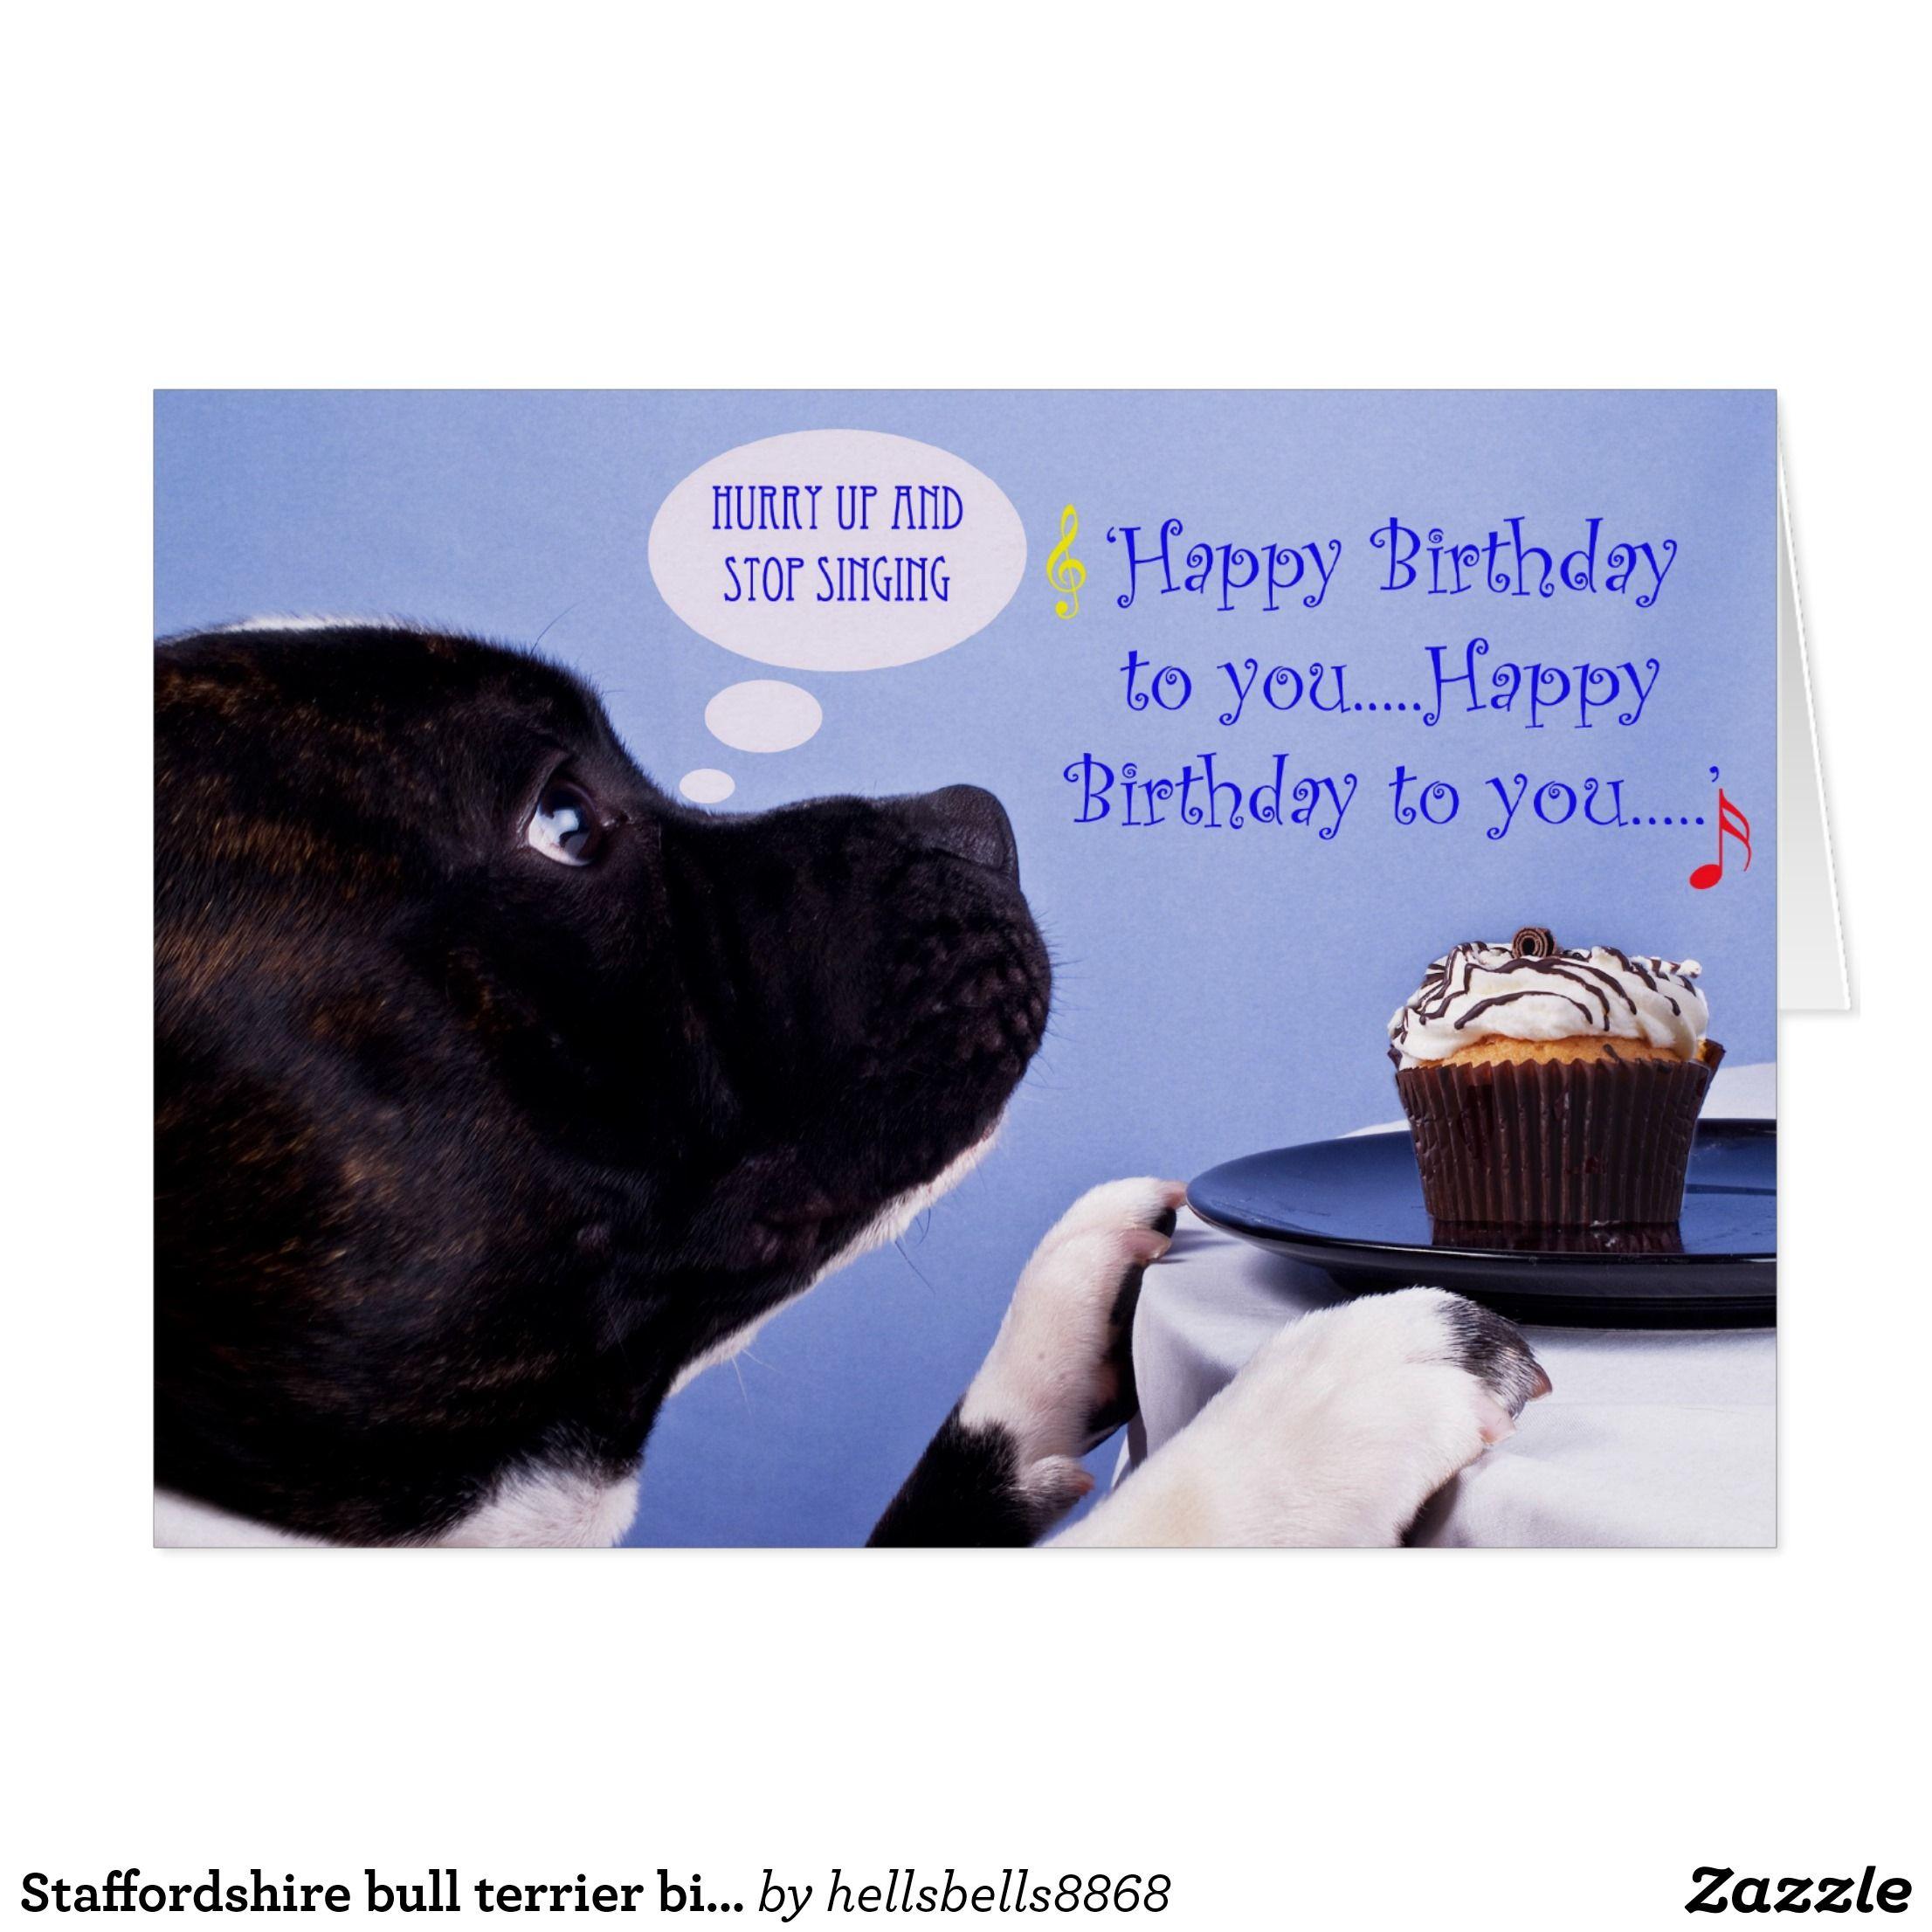 Staffordshire Bull Terrier Birthday Card Zazzle Com Bull Terrier Staffordshire Bull Terrier Birthday Cards